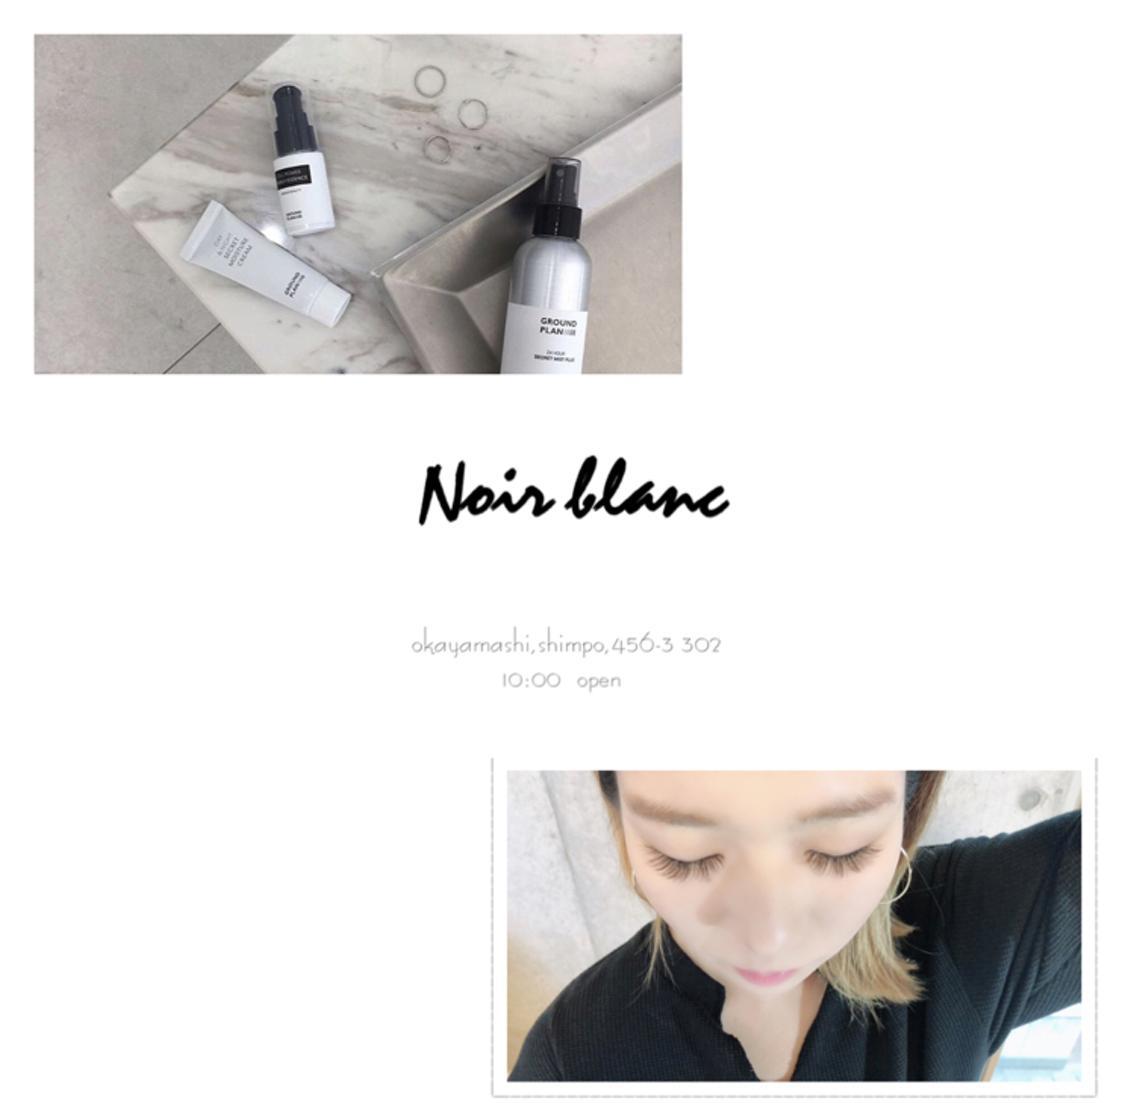 Noir blanc所属・Noirblancの掲載